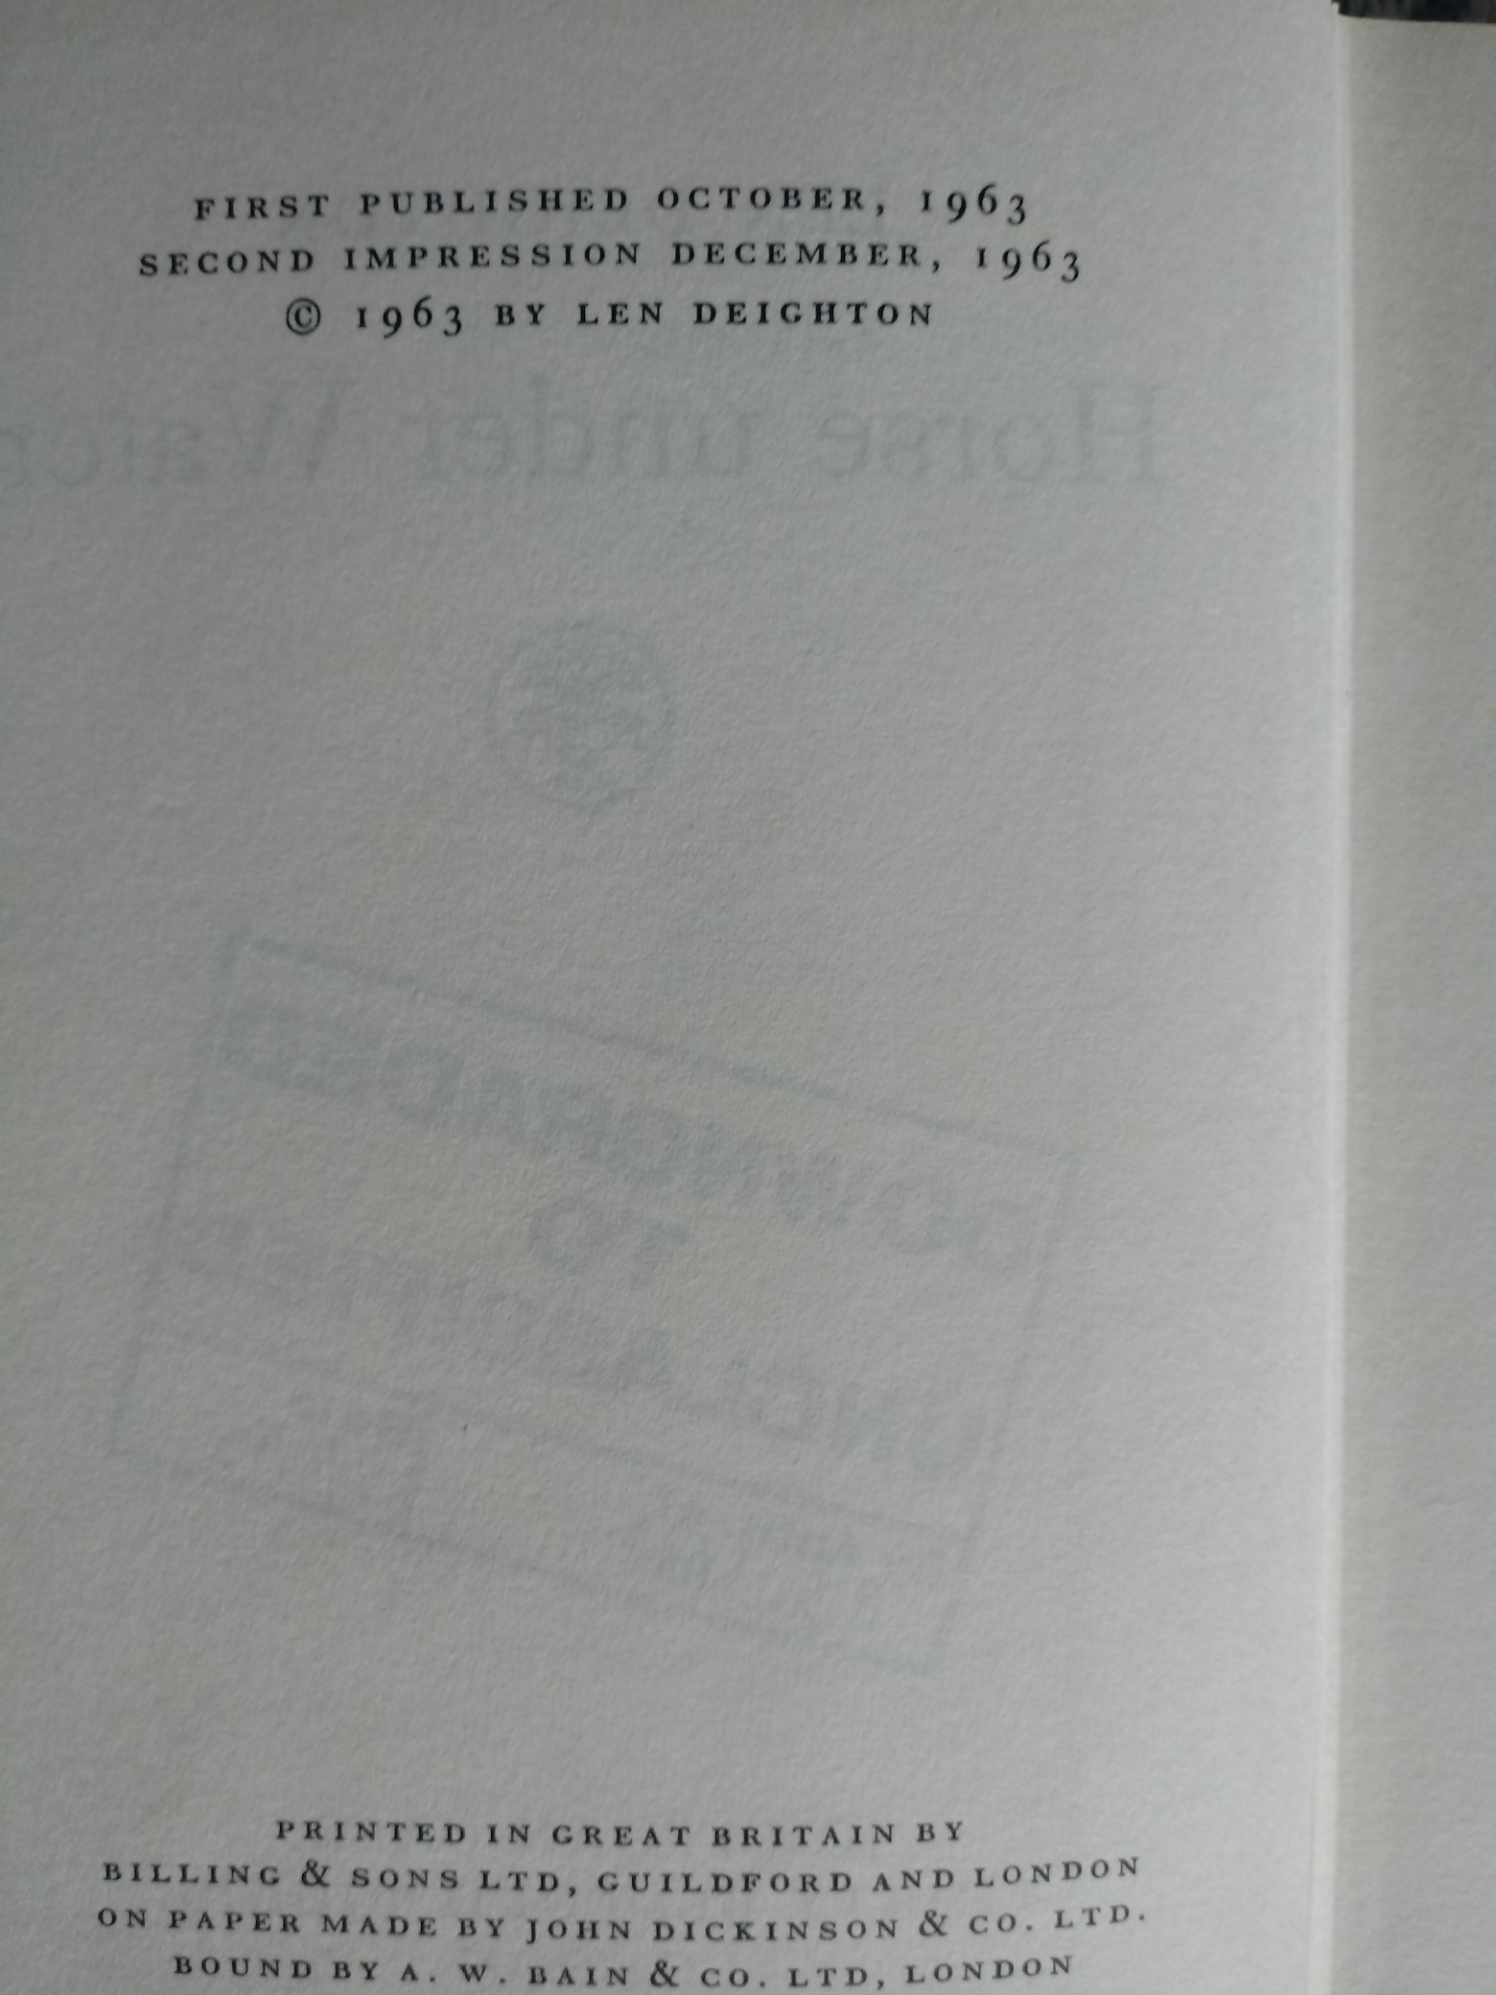 2 x Len Deighton hardback books 1- The Ipcress File Secret File No. 1 223 pages published 1962 - Image 7 of 7